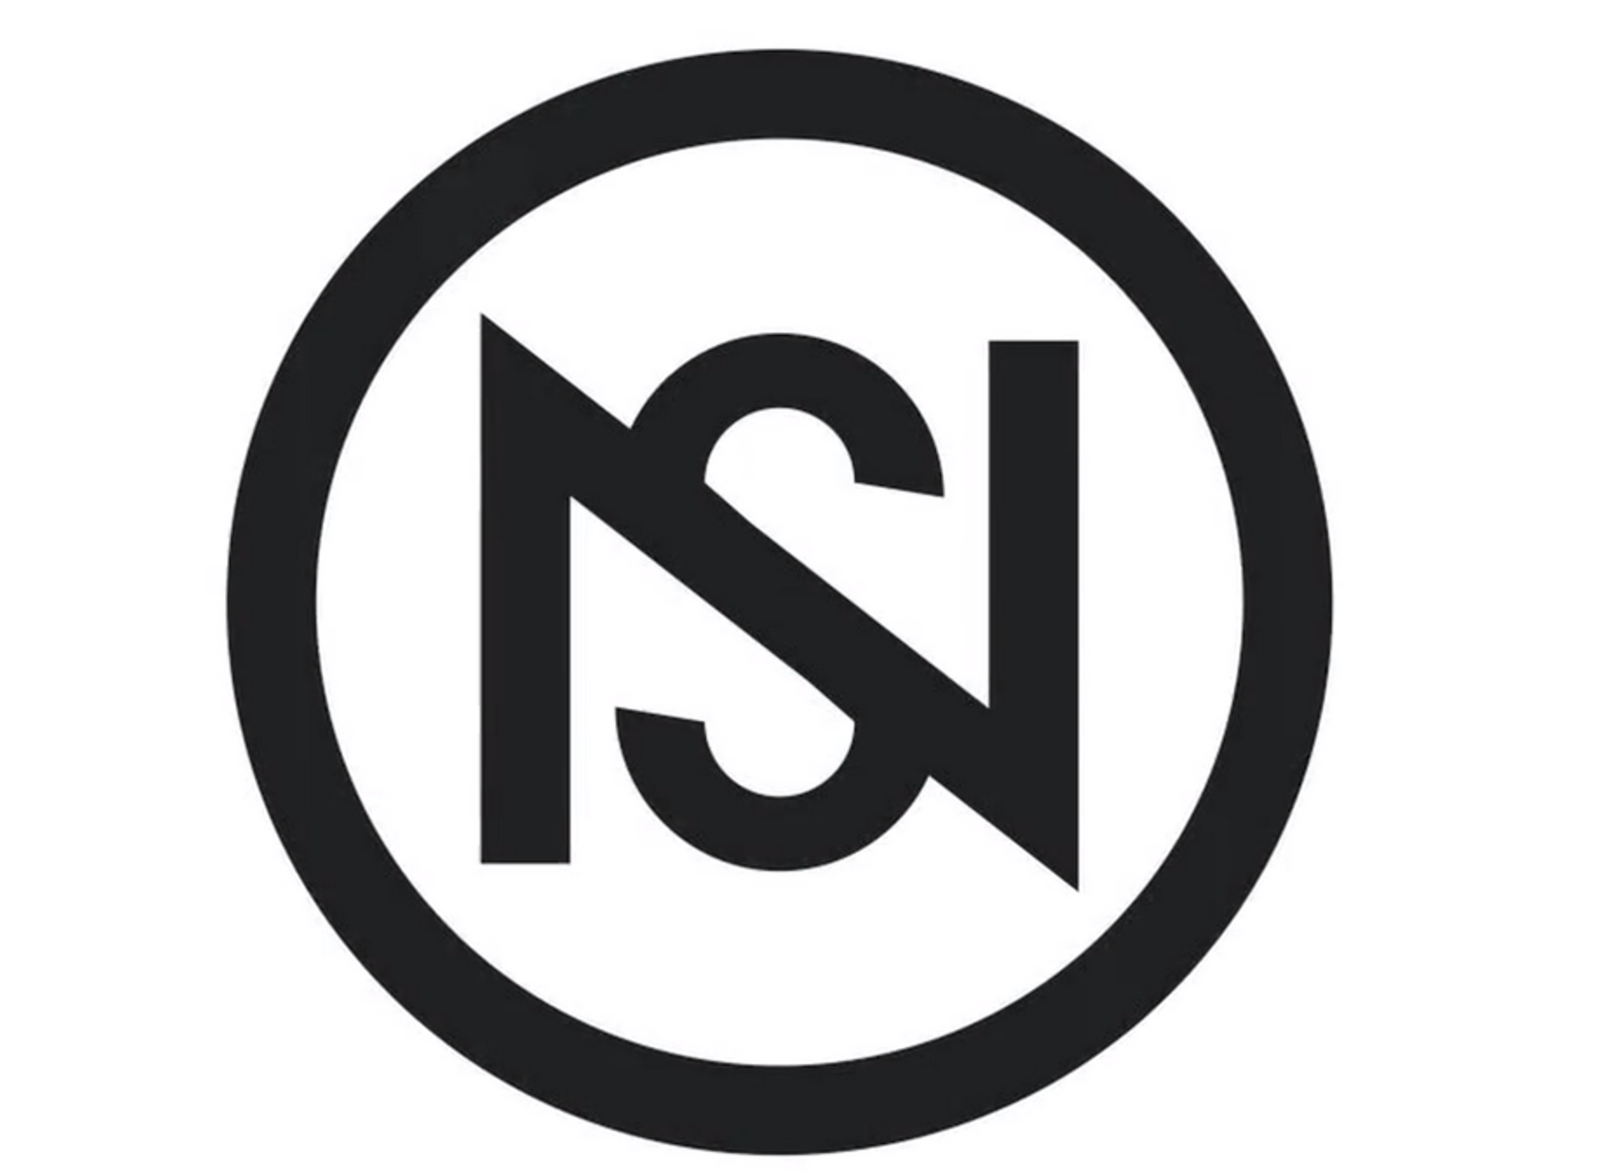 Nuits Sonores festival logo, design by Superscript²